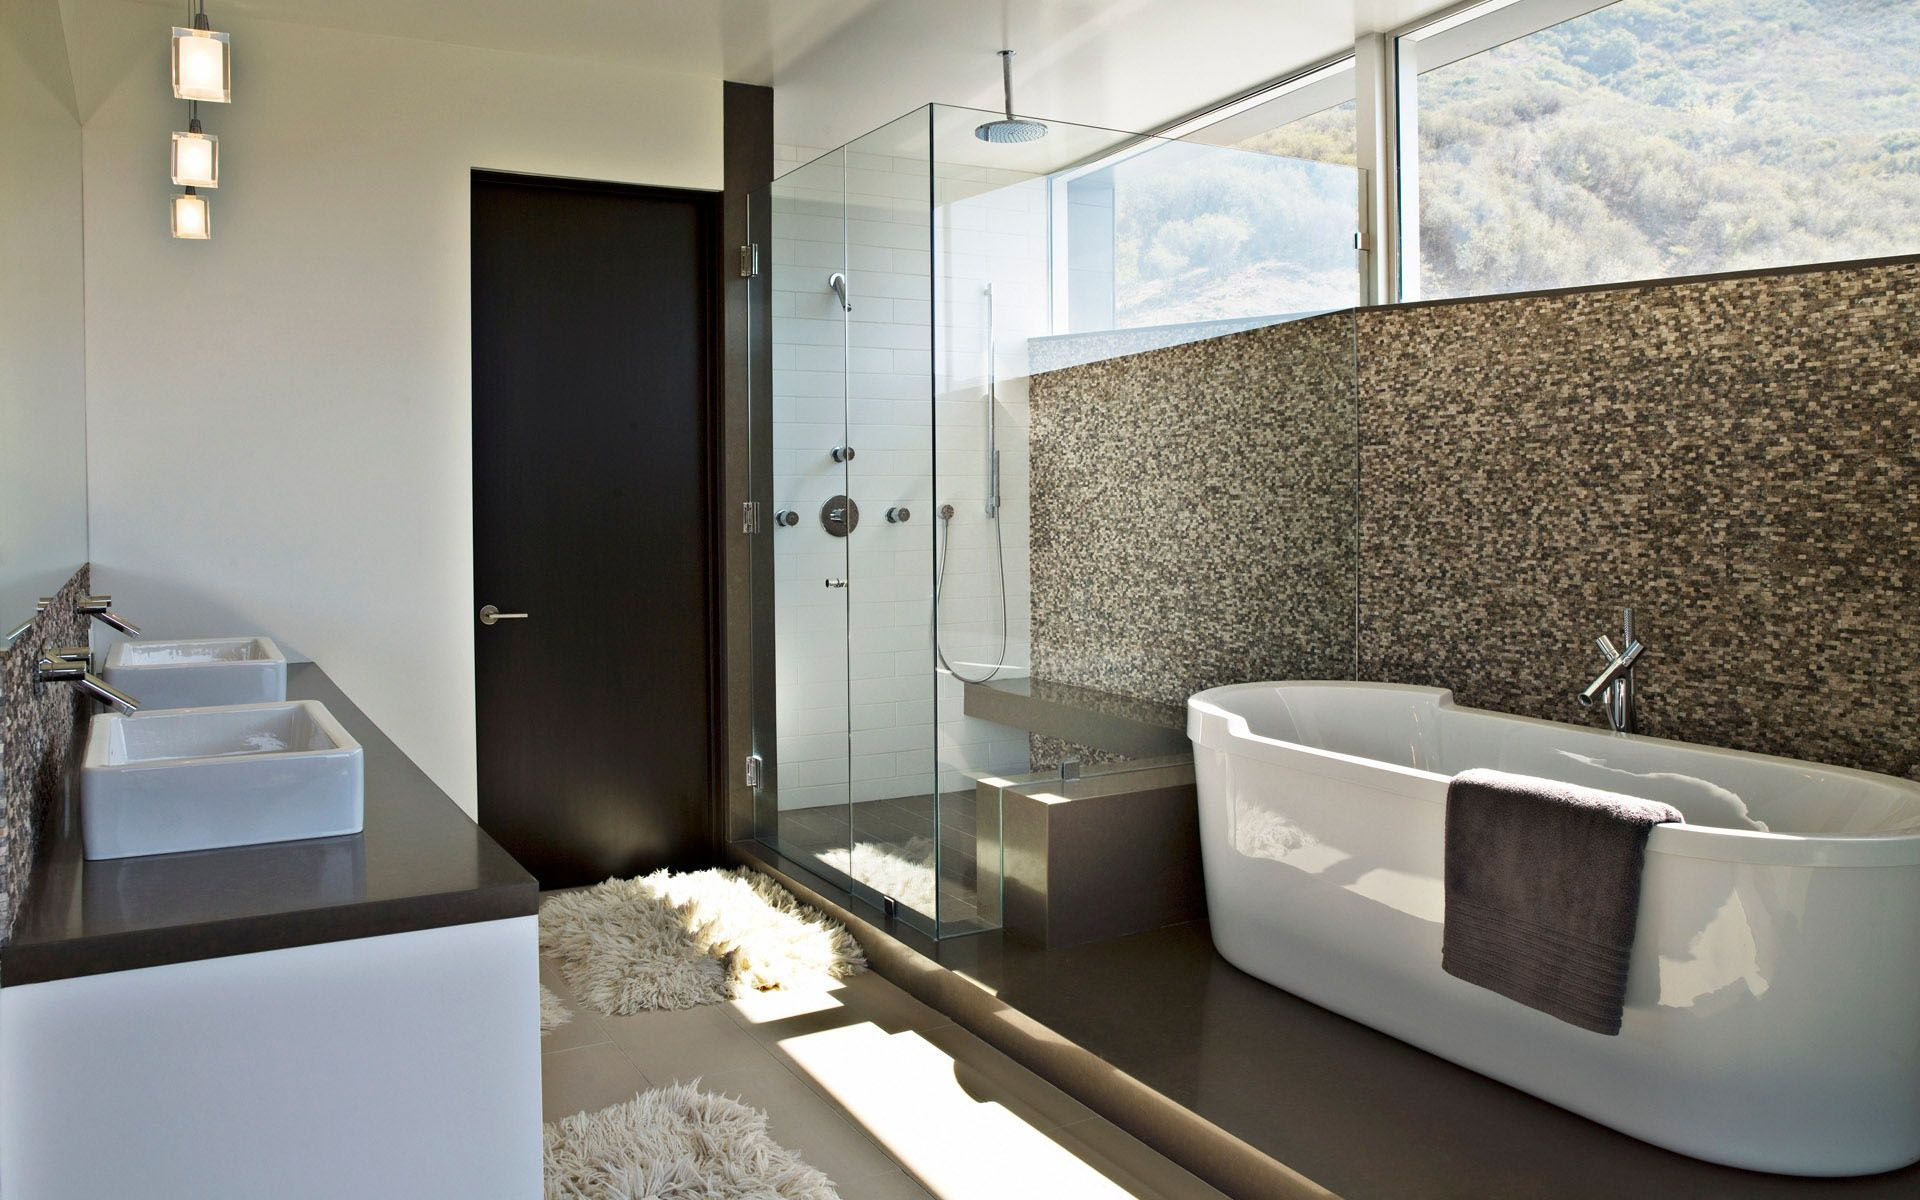 . Bathroom Design Uk Signupmoney Luxury Pioneering Bathroom Designs